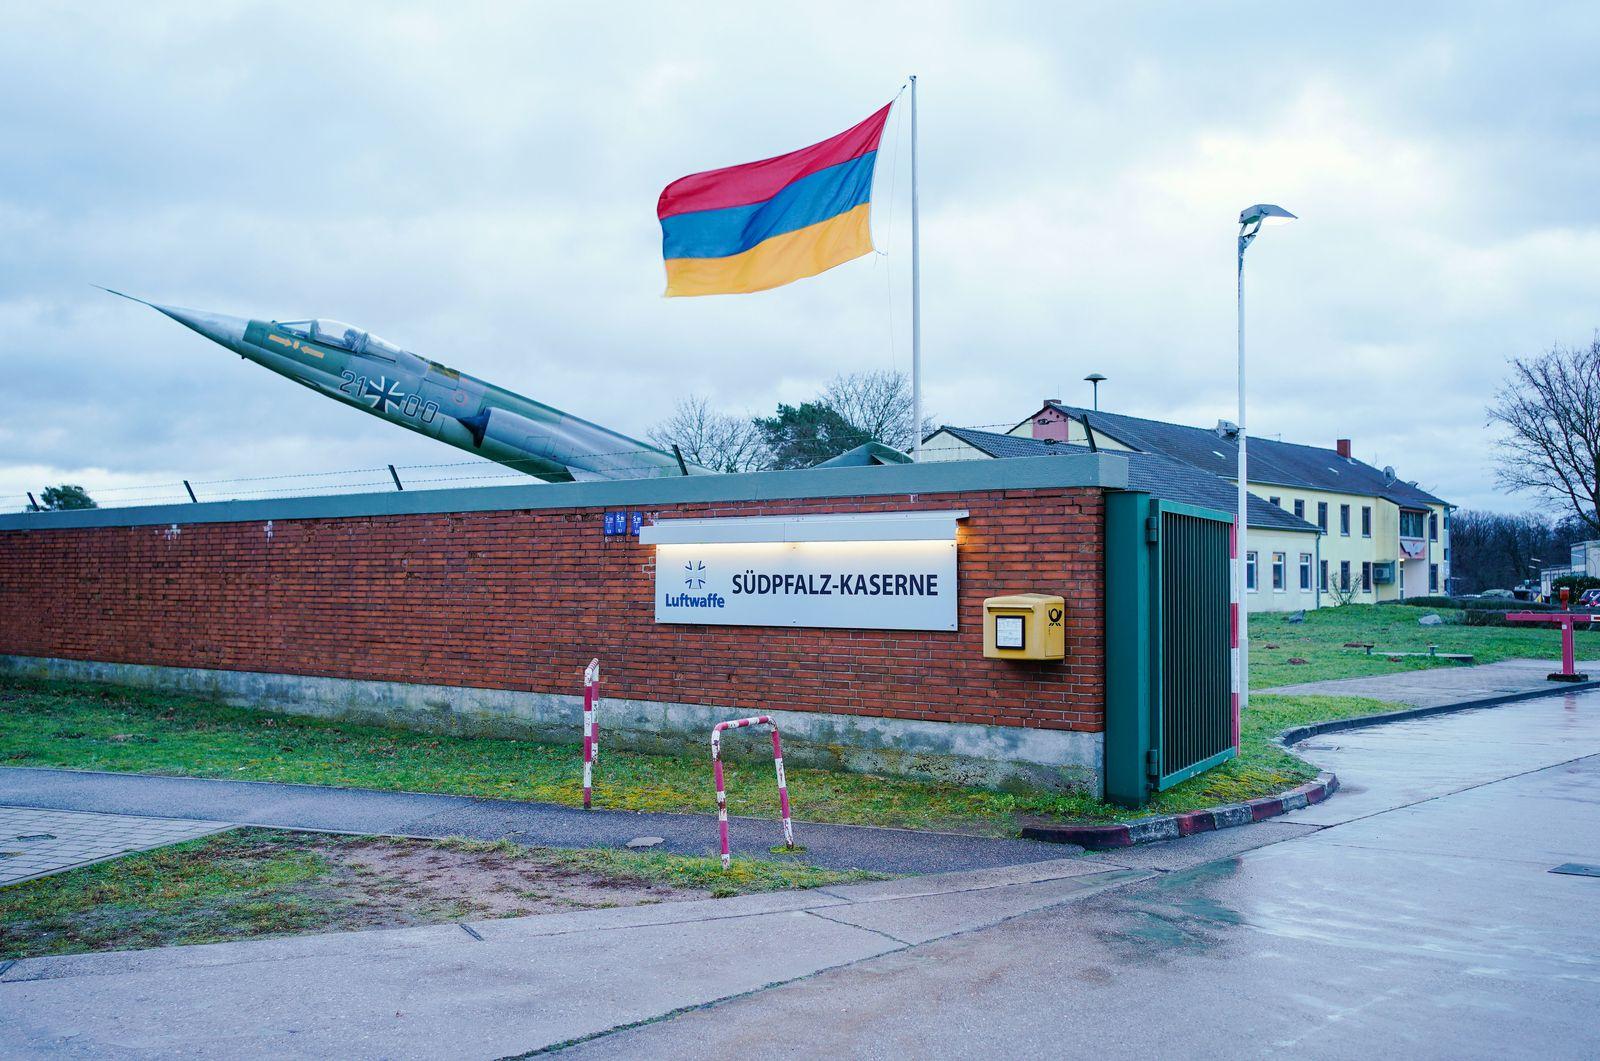 Südpfalz-Kaserne